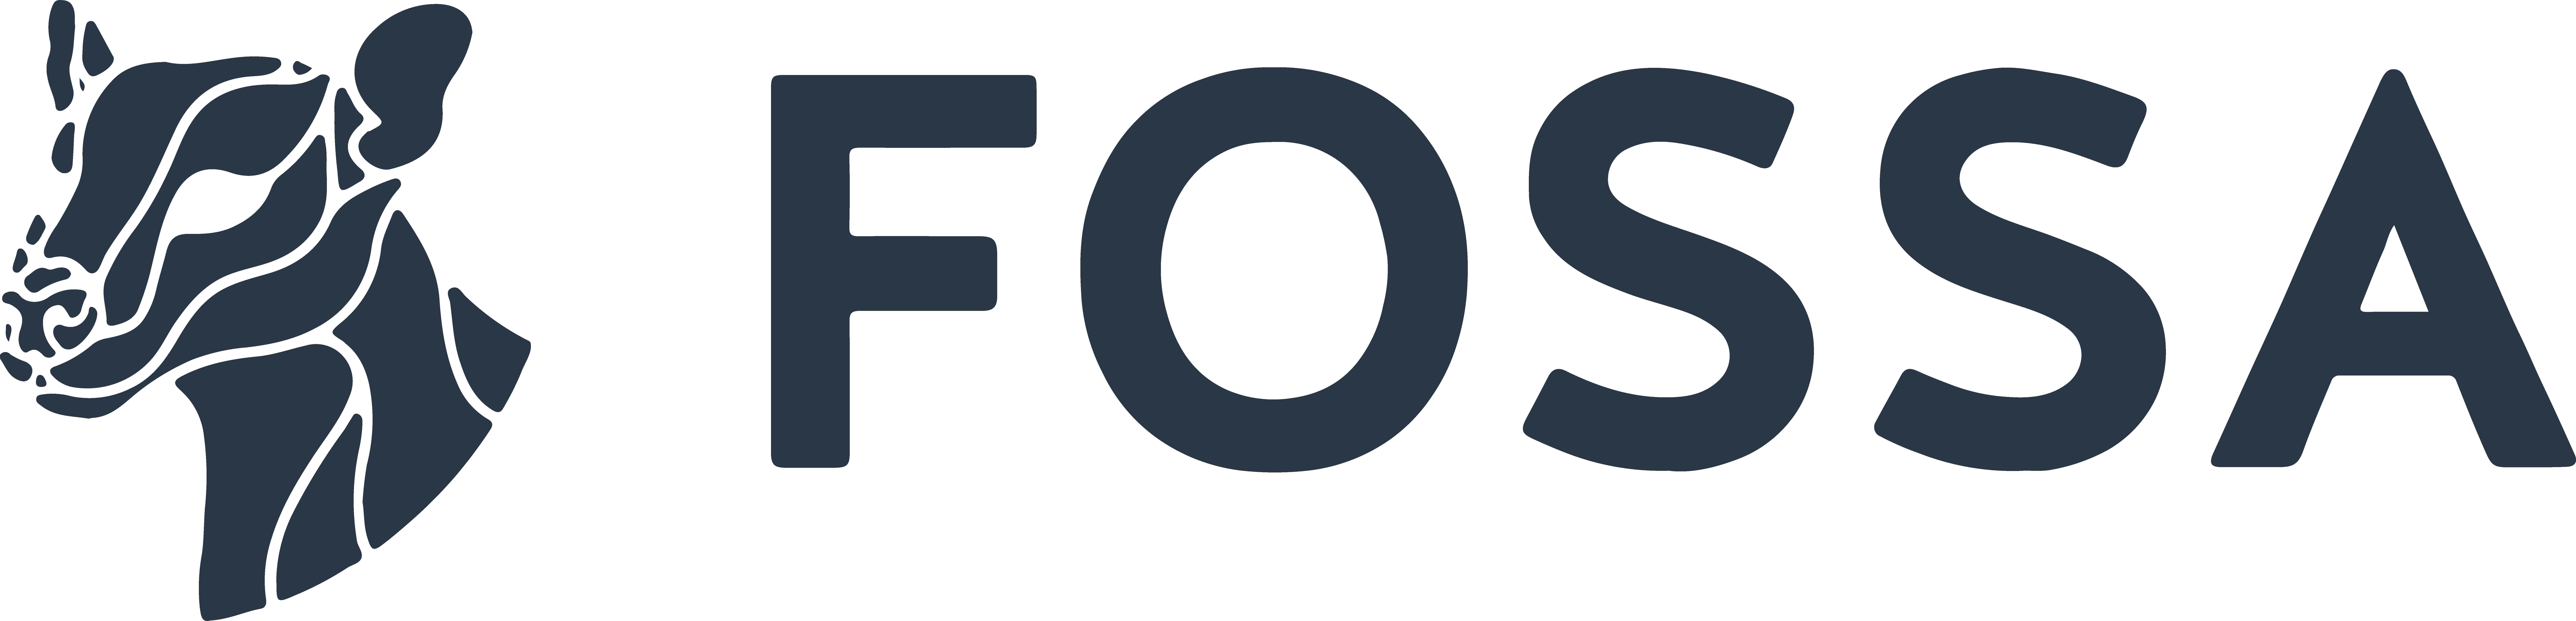 FOSSA logo